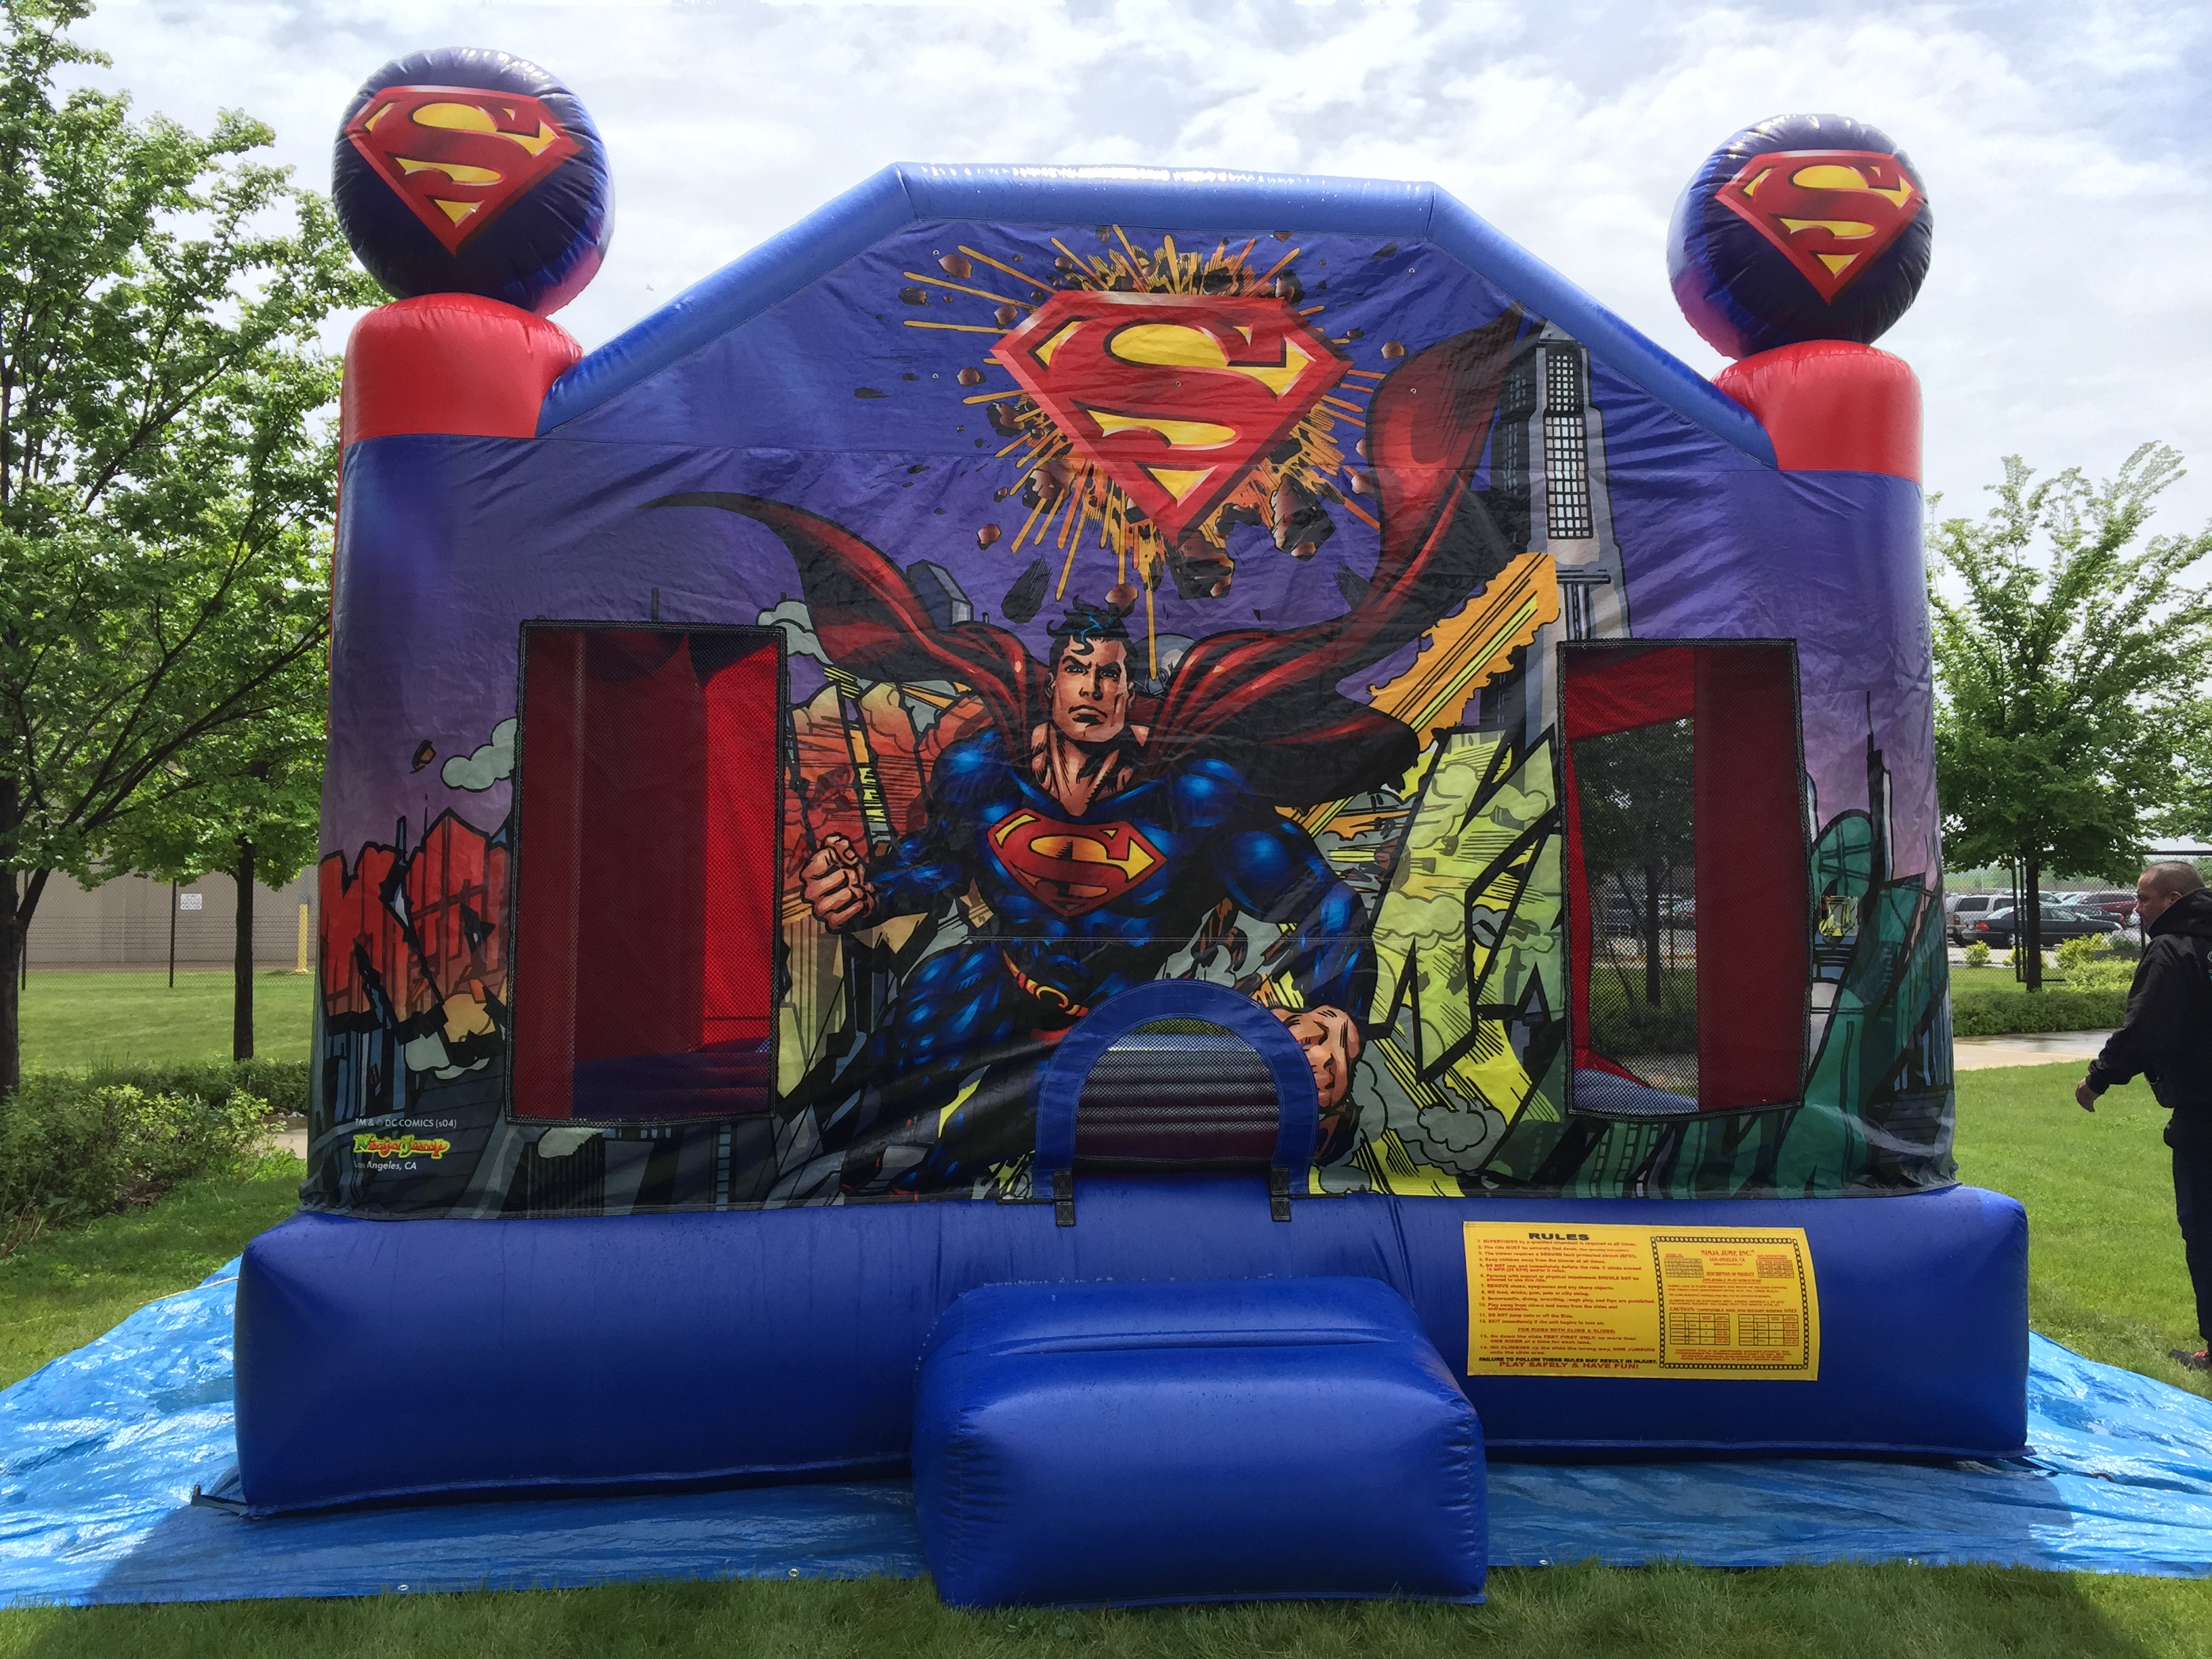 superman bounce house inflatable rental Cape Coral FL   Naples FL